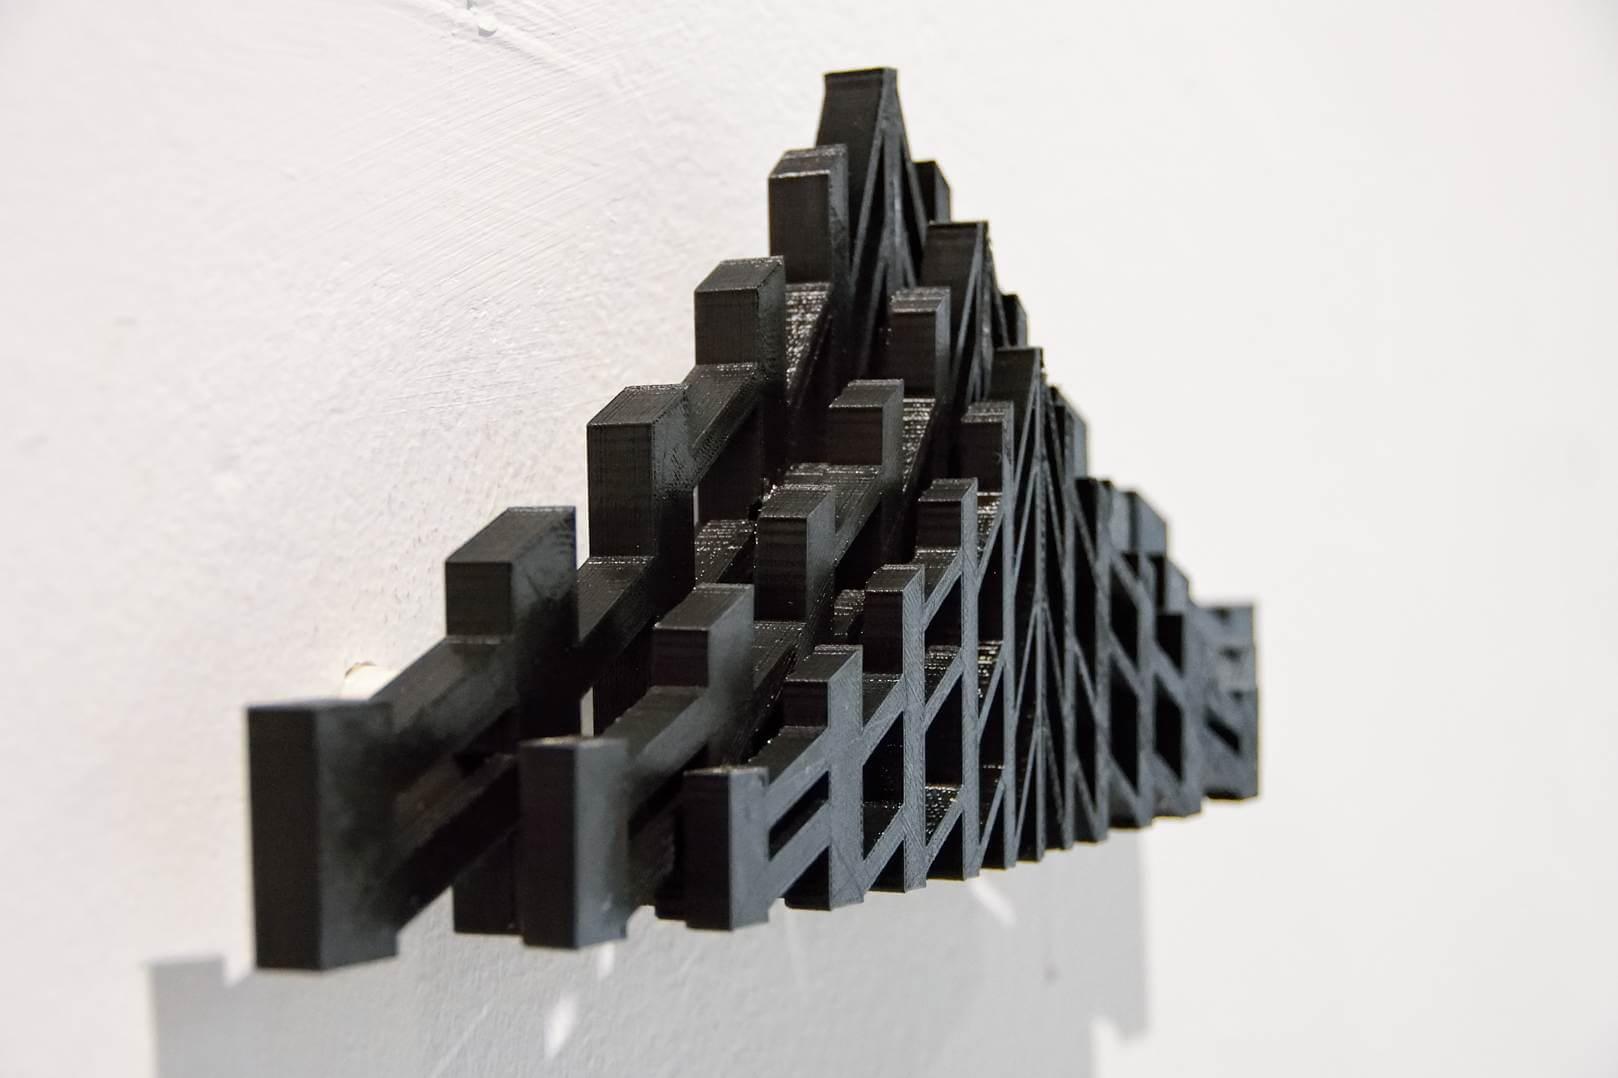 PICAZO,2018, ST, 3Dprint, 13x30,5x4cm (2)